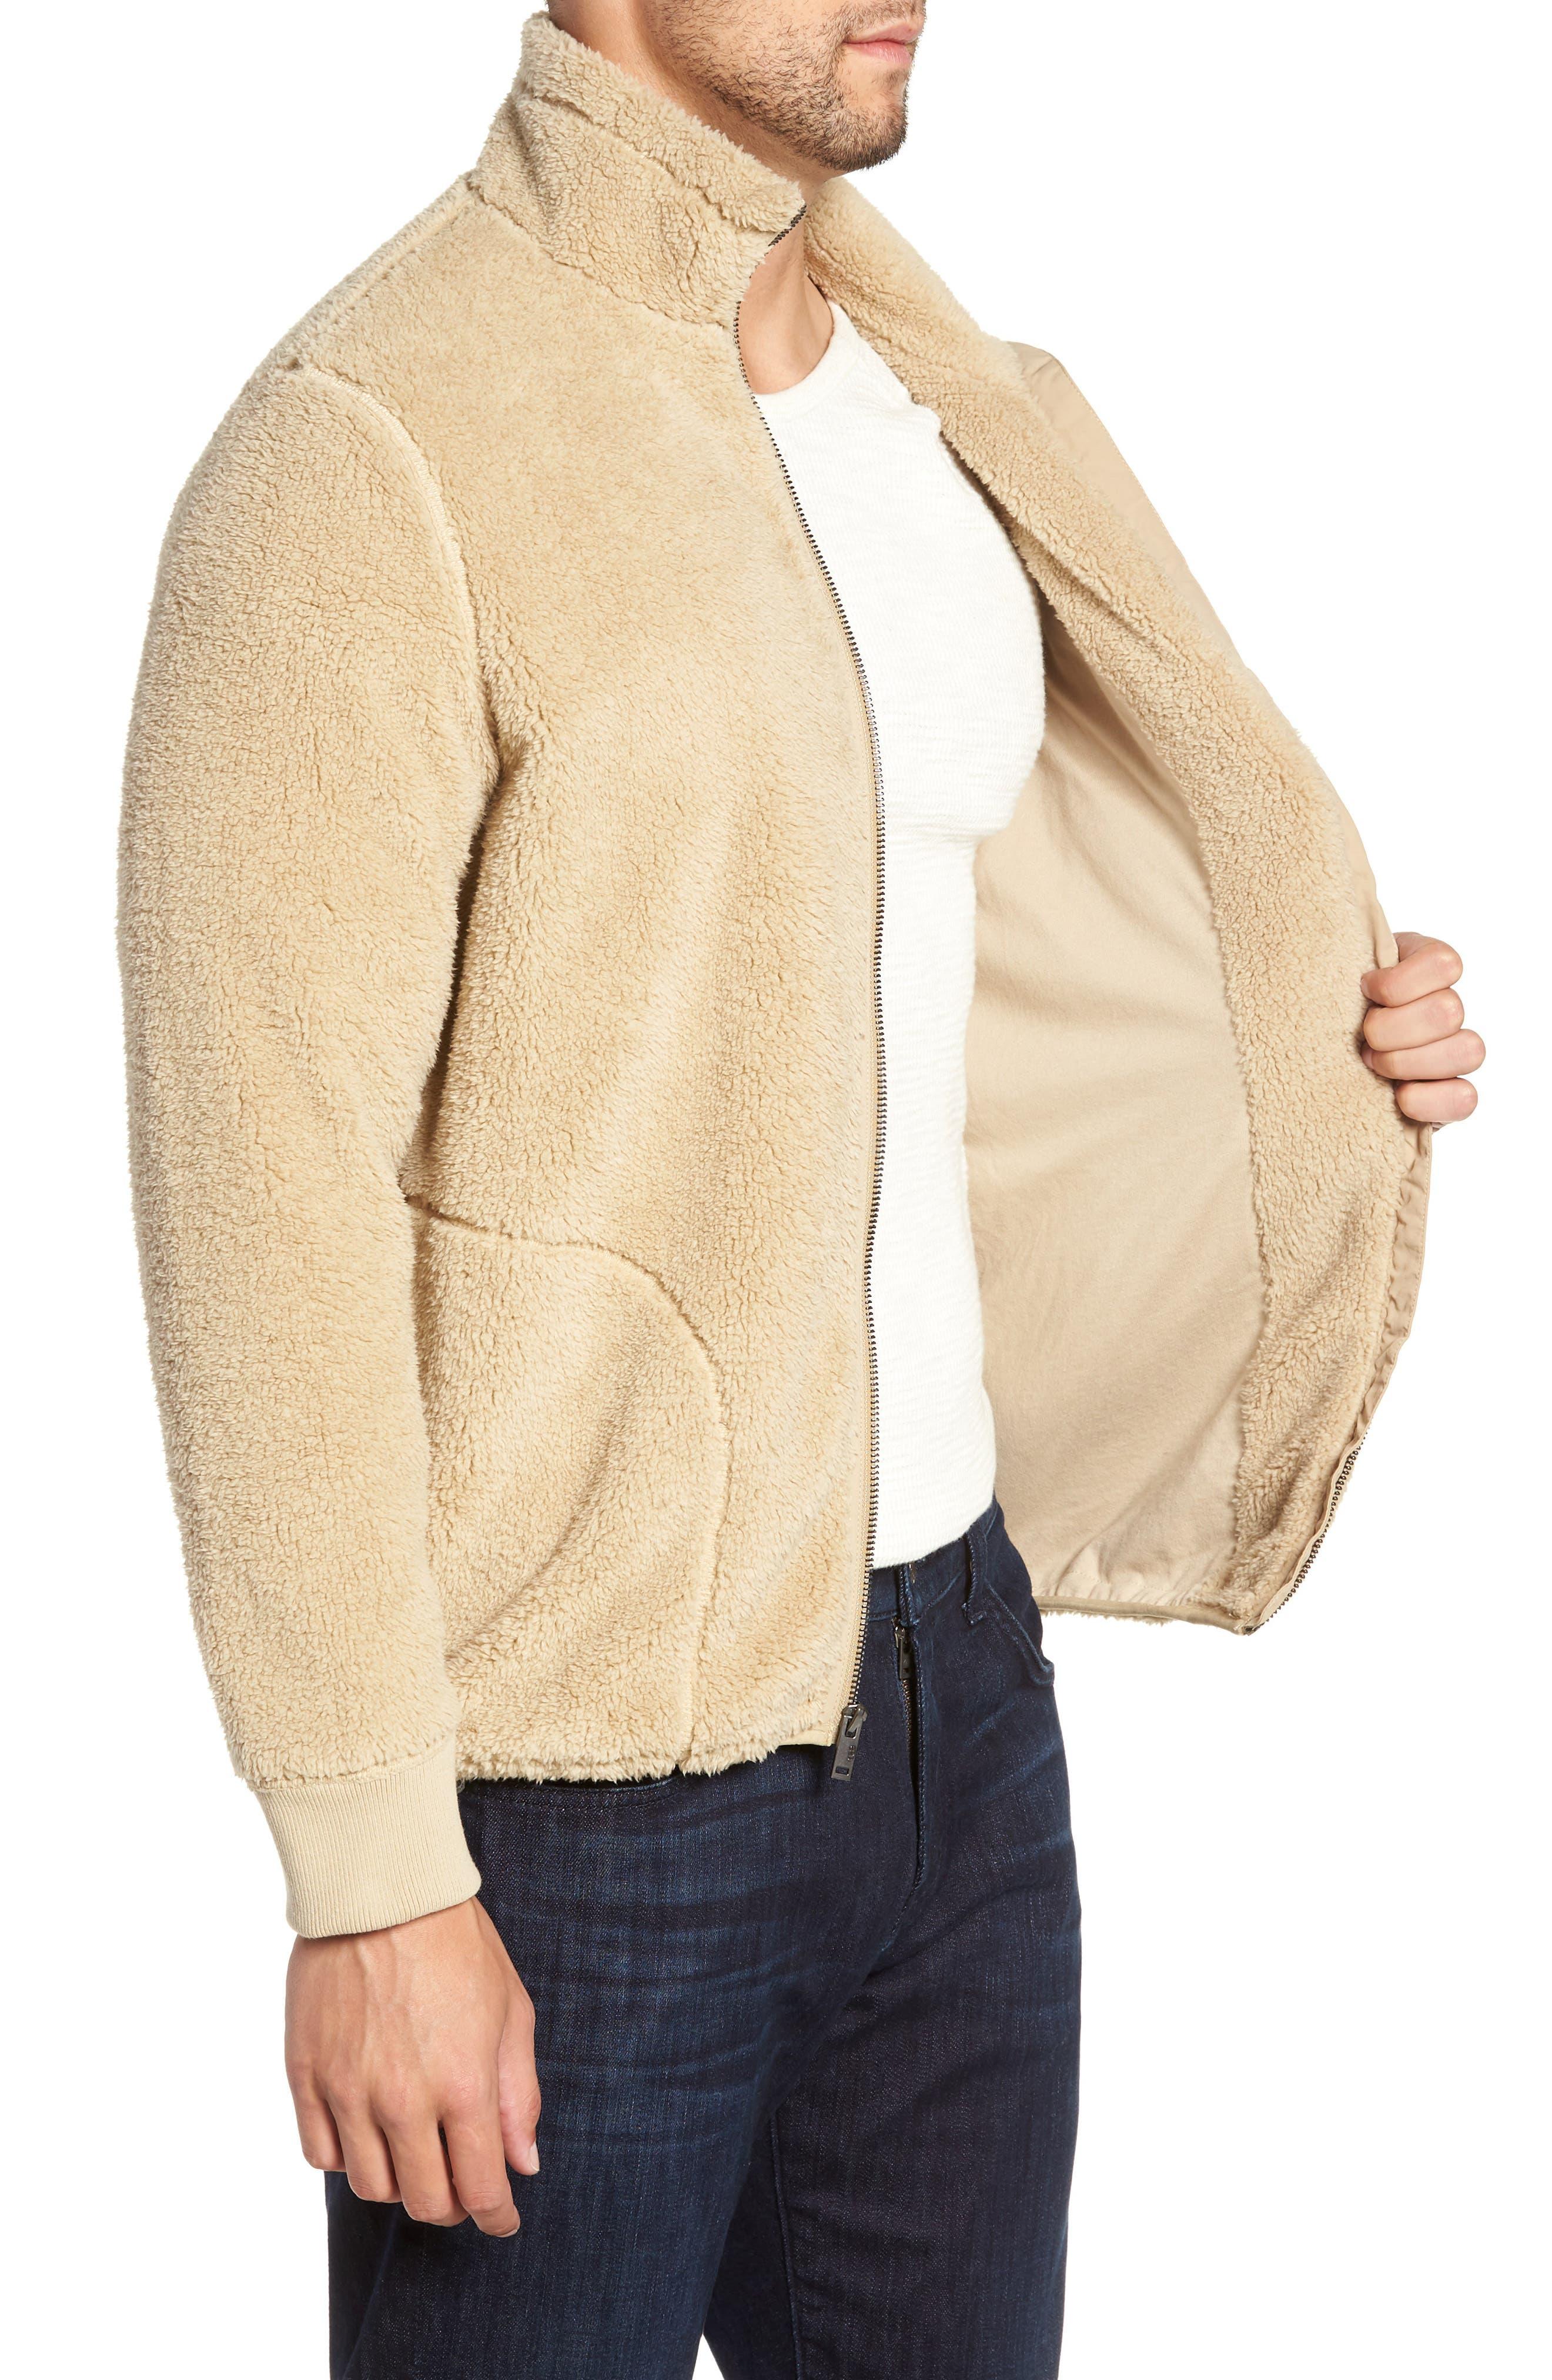 Lucas High Pile Fleece Sweater Jacket,                             Alternate thumbnail 3, color,                             SAND